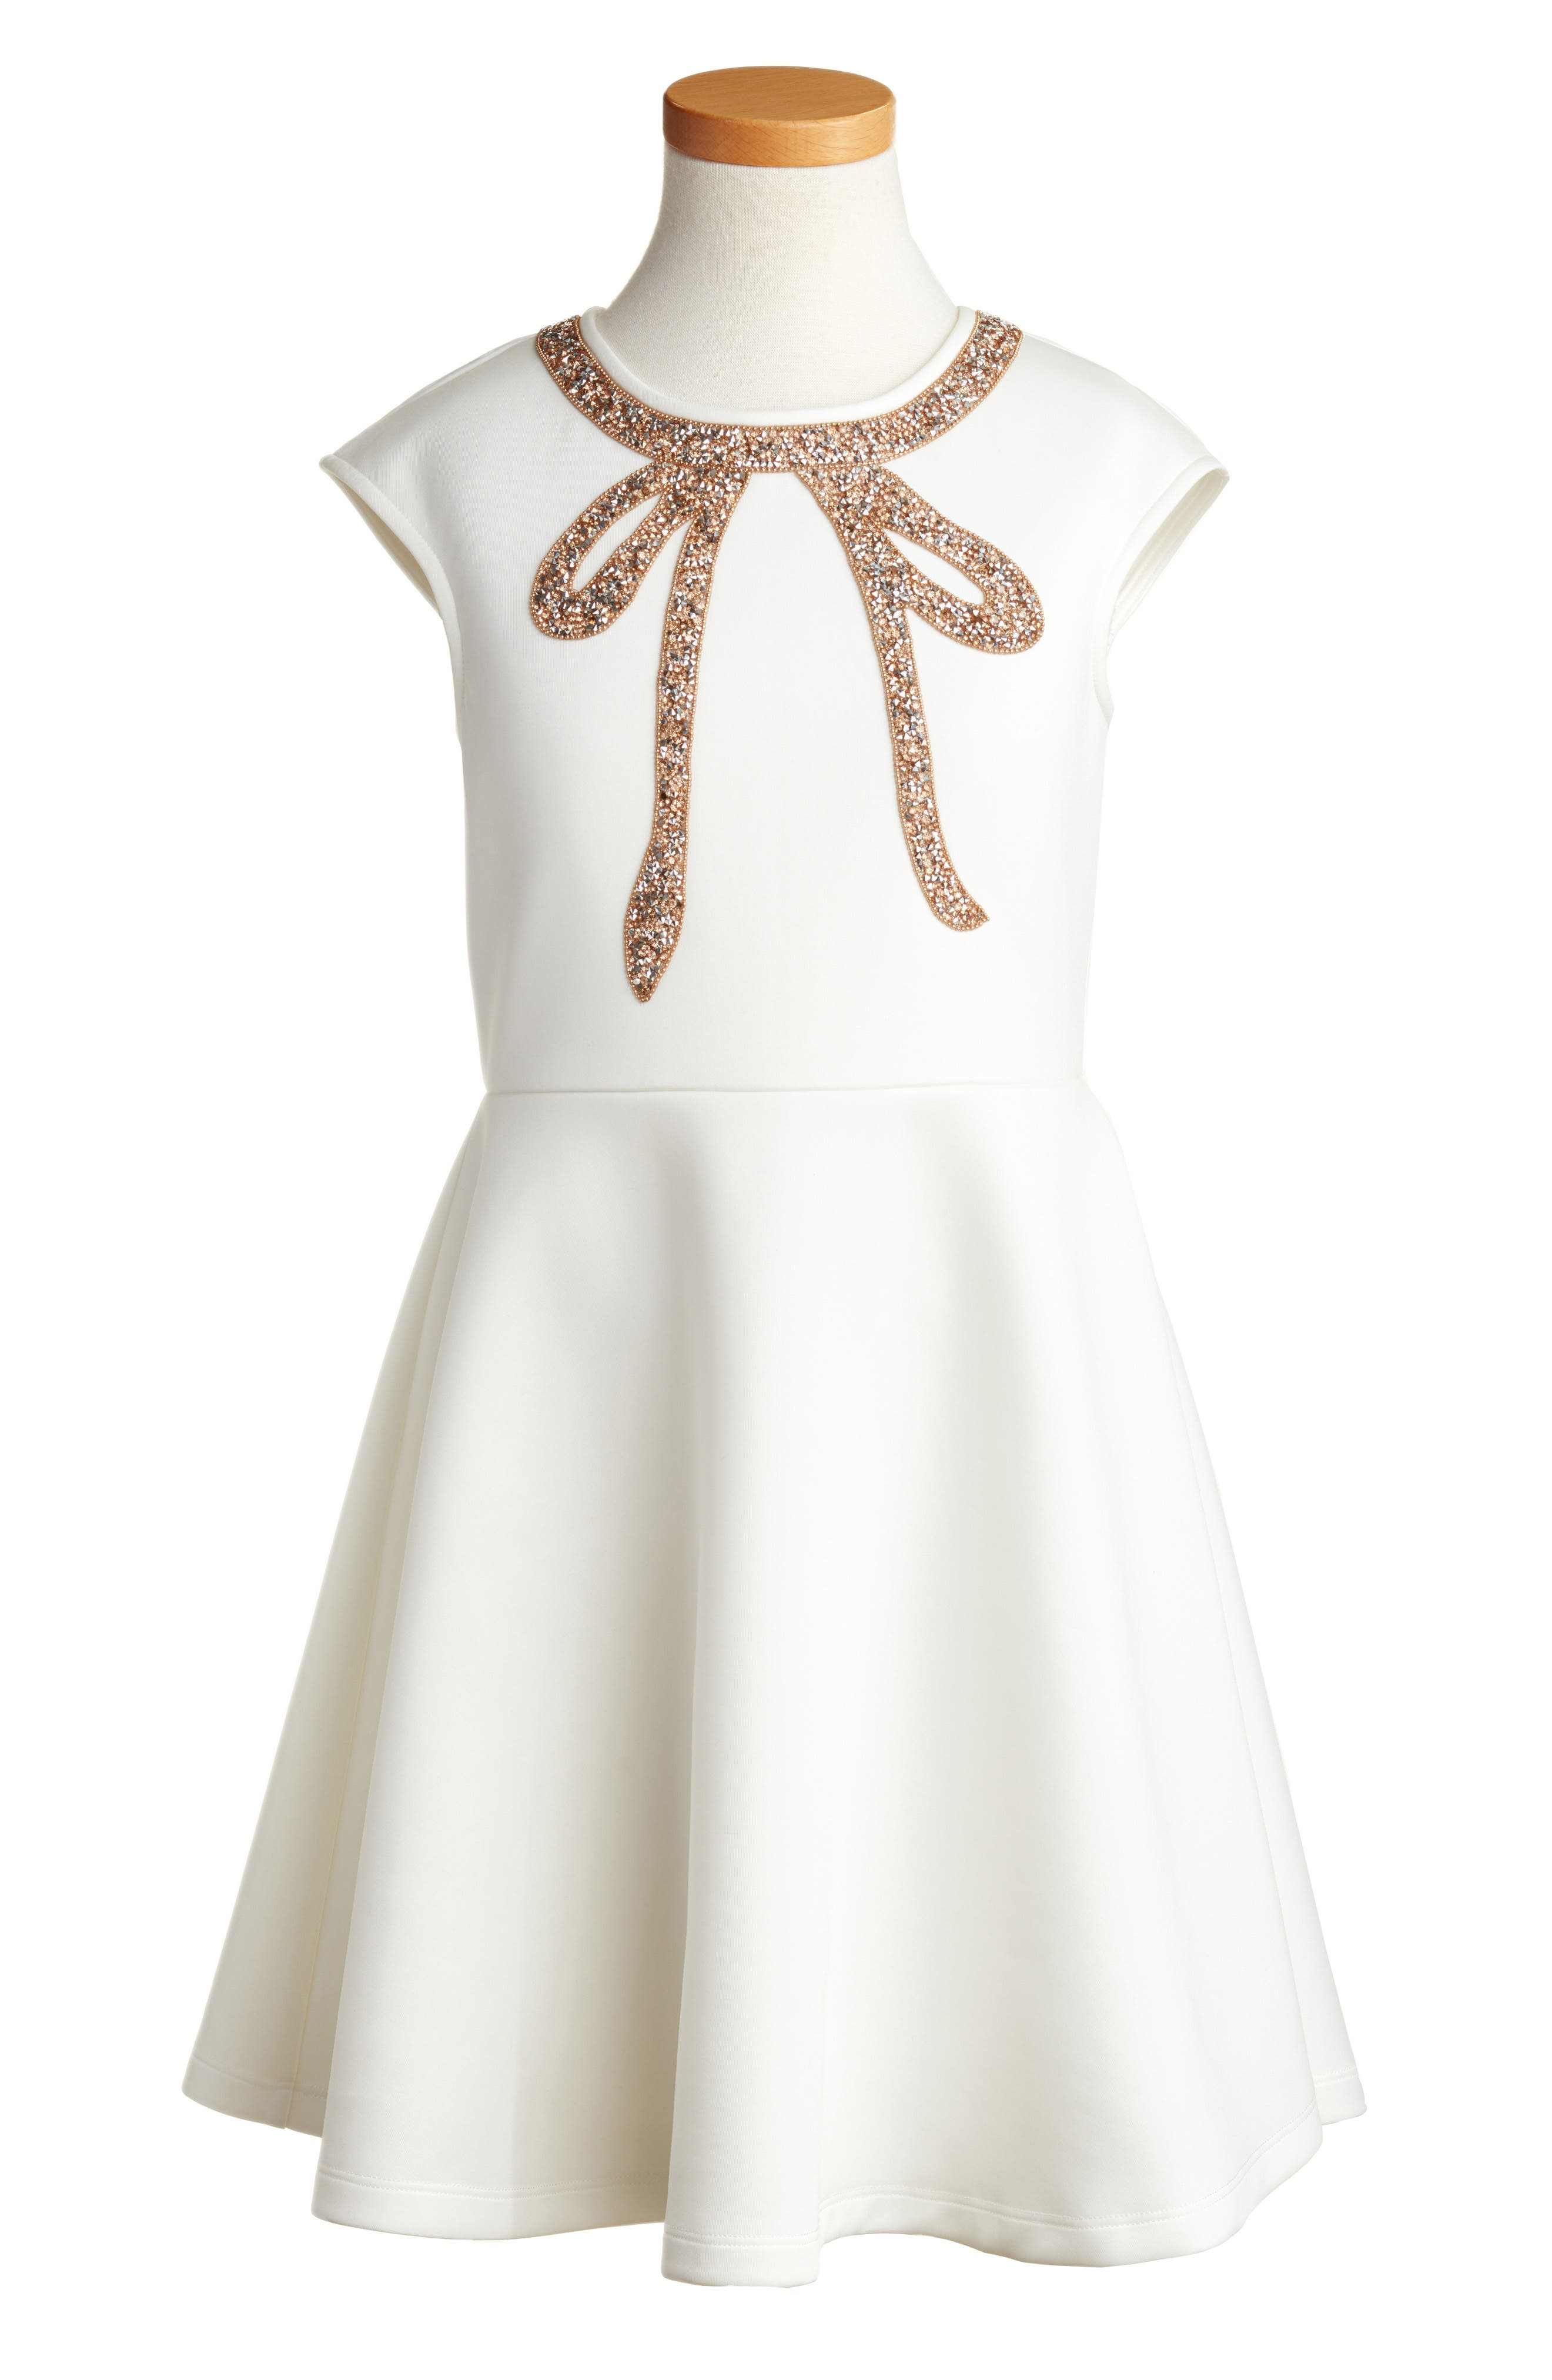 Main Image - Hannah Banana Cap Sleeve Bow Dress (Big Girls)